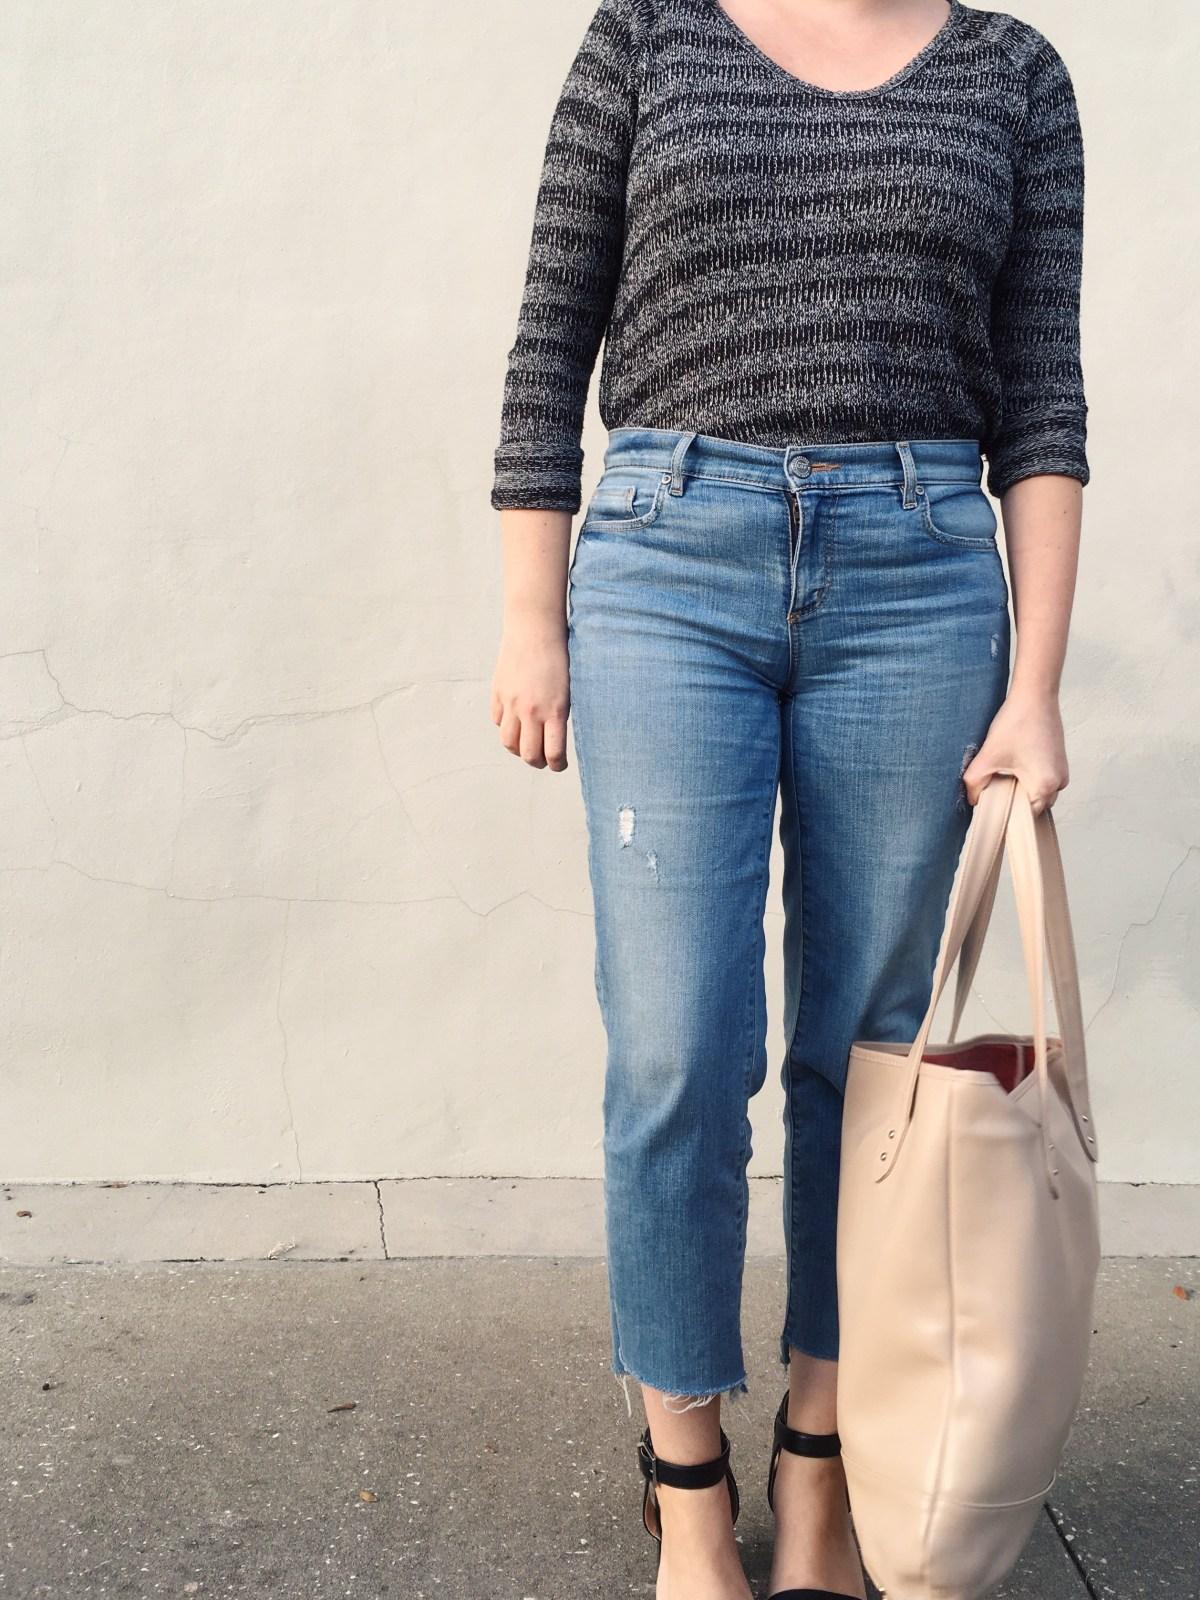 DIY step hem jeans | keiralennox.com